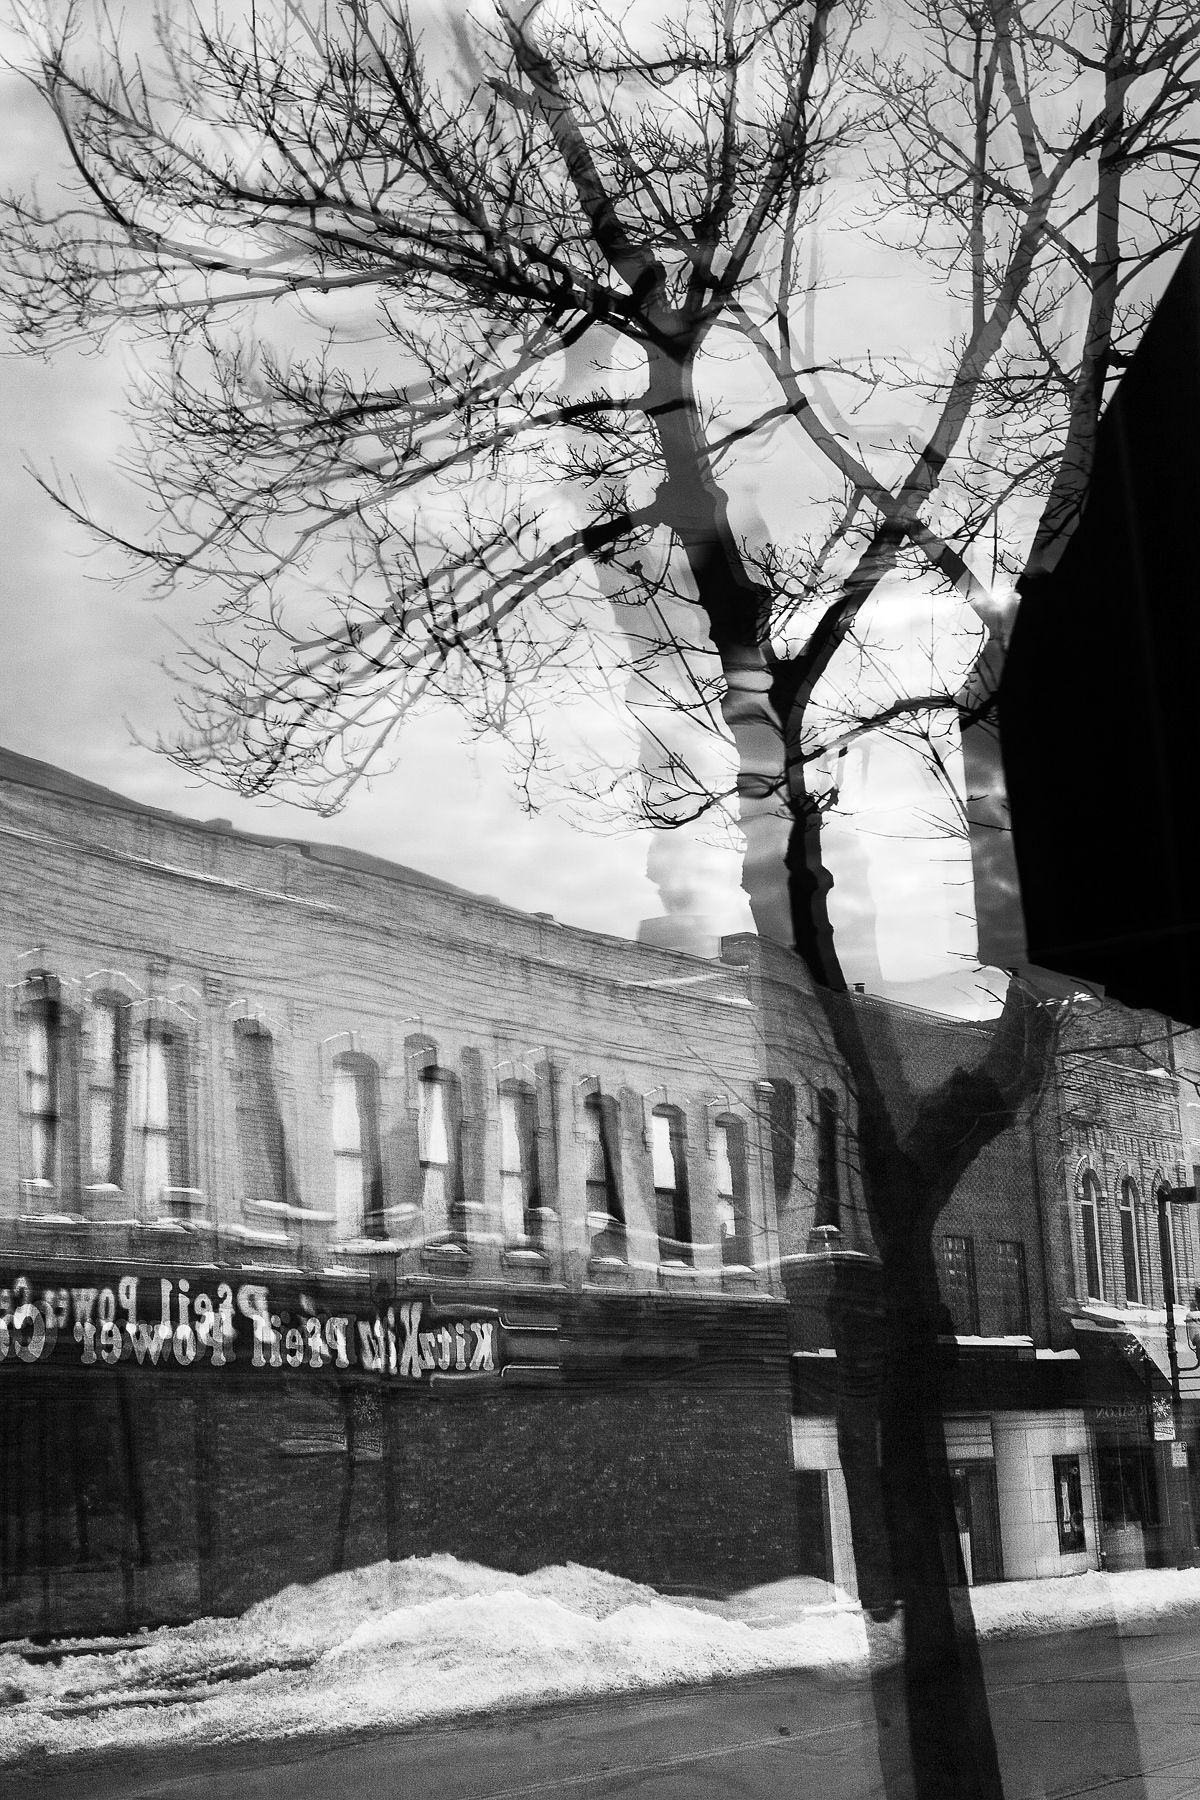 Main St., Oshkosh, WI, 2007